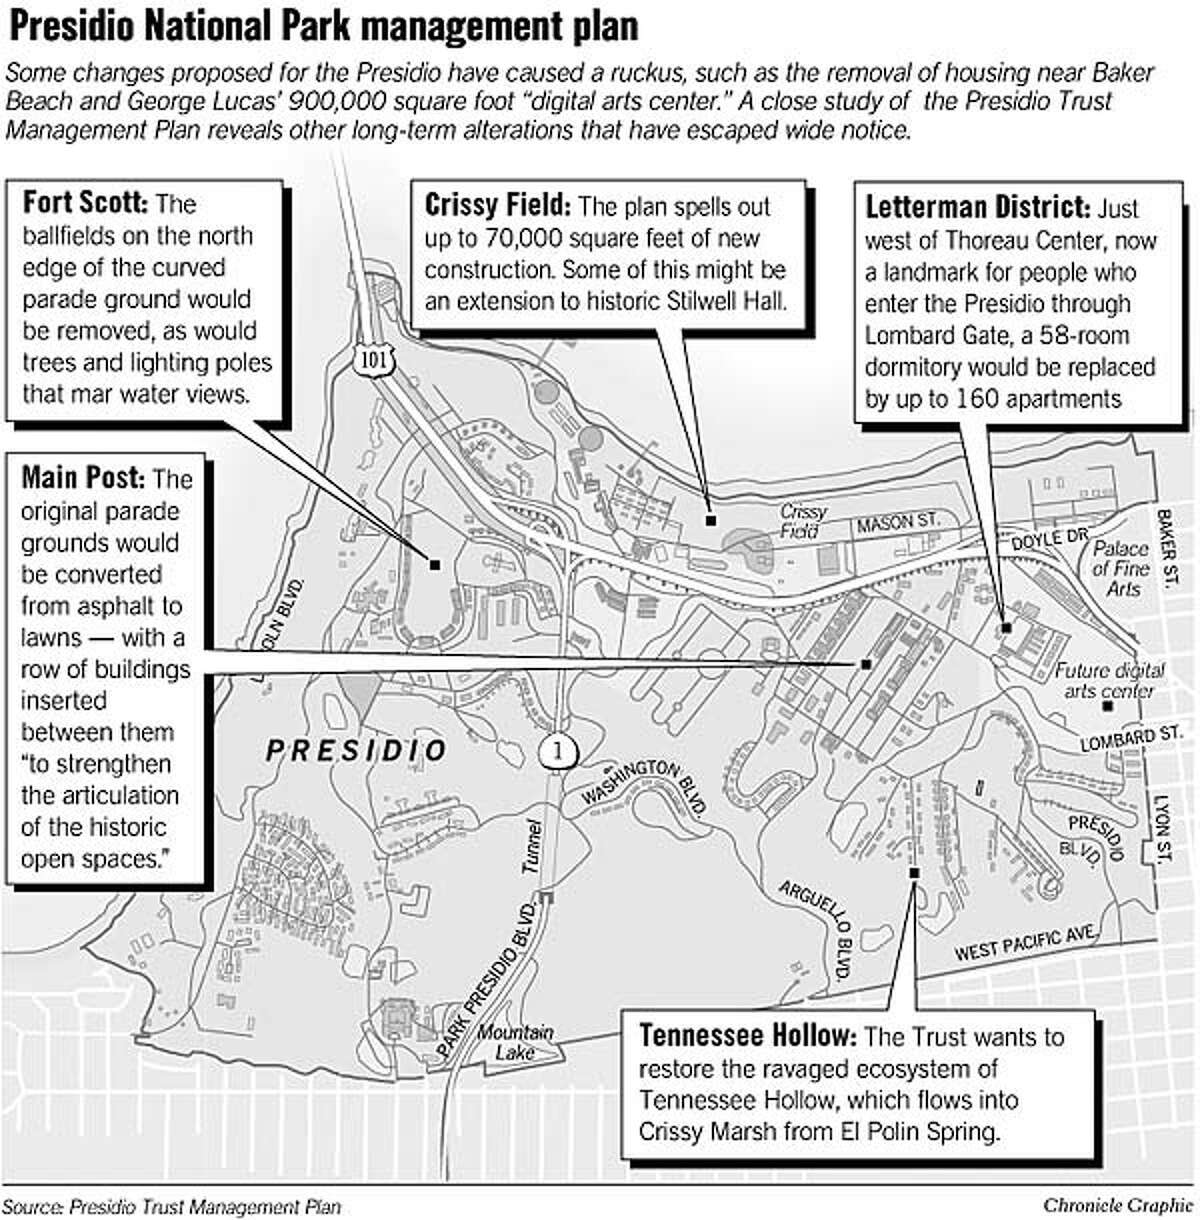 Presidio National Park Management Plan. Chronicle Graphic